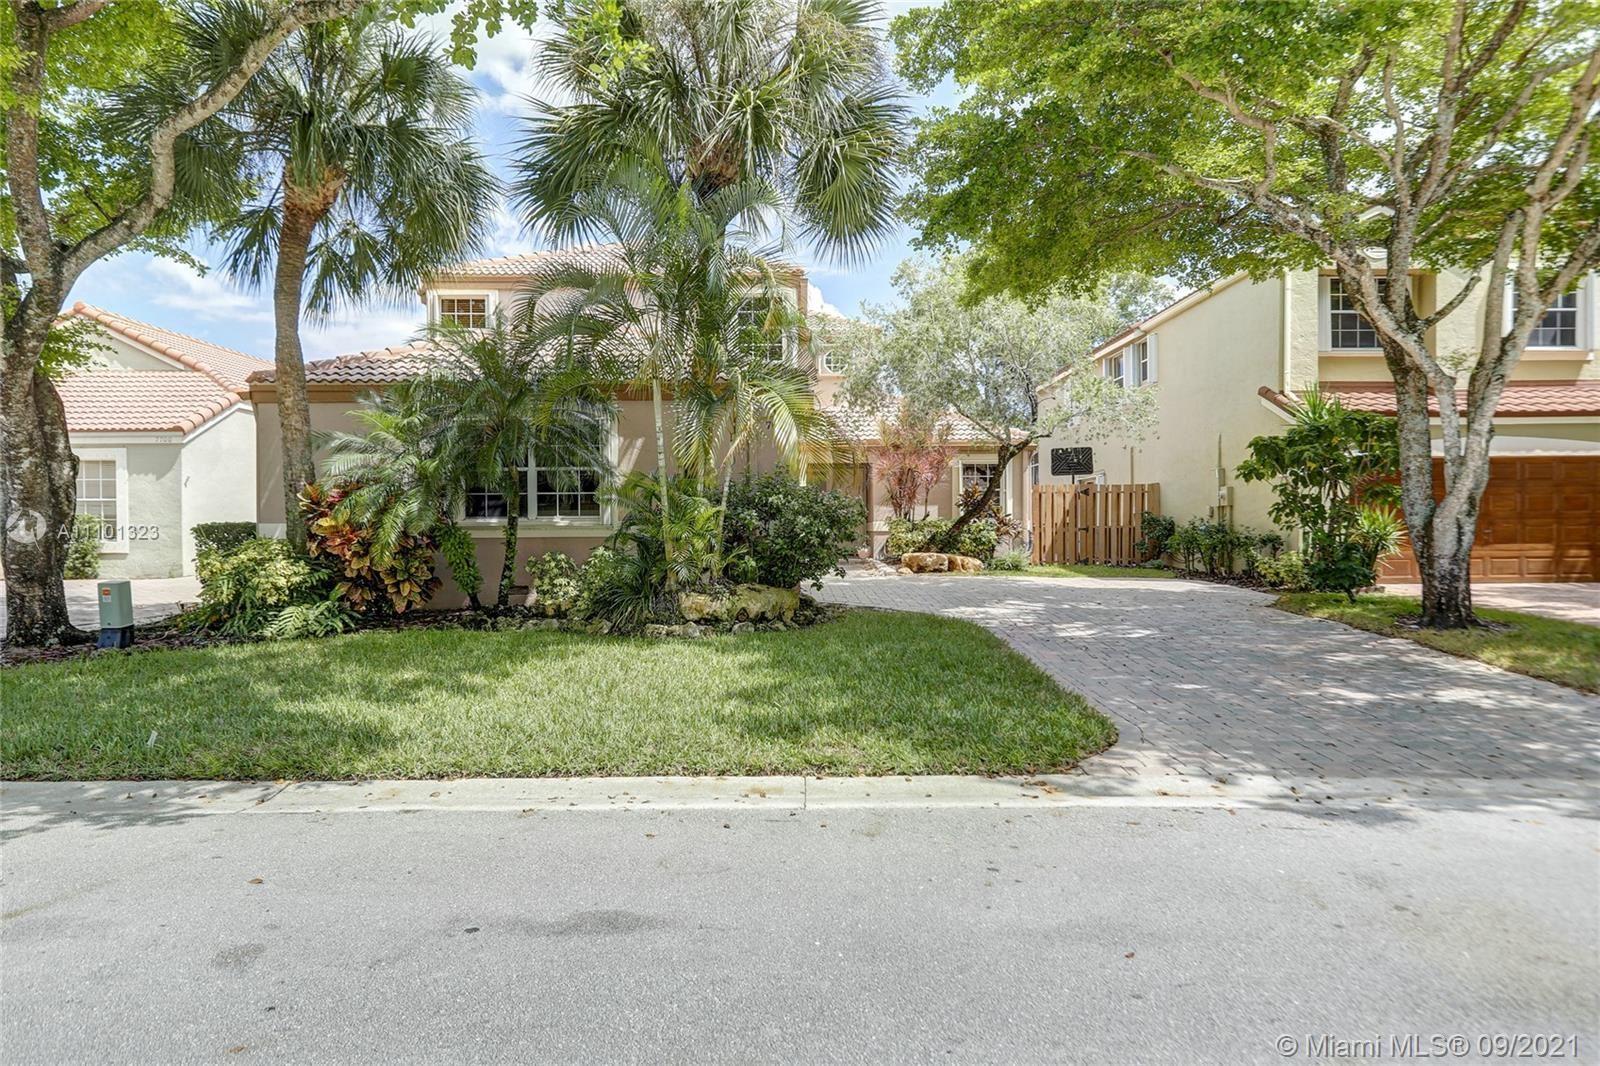 7680 NW 61st Ter, Parkland, FL 33067 - #: A11101323